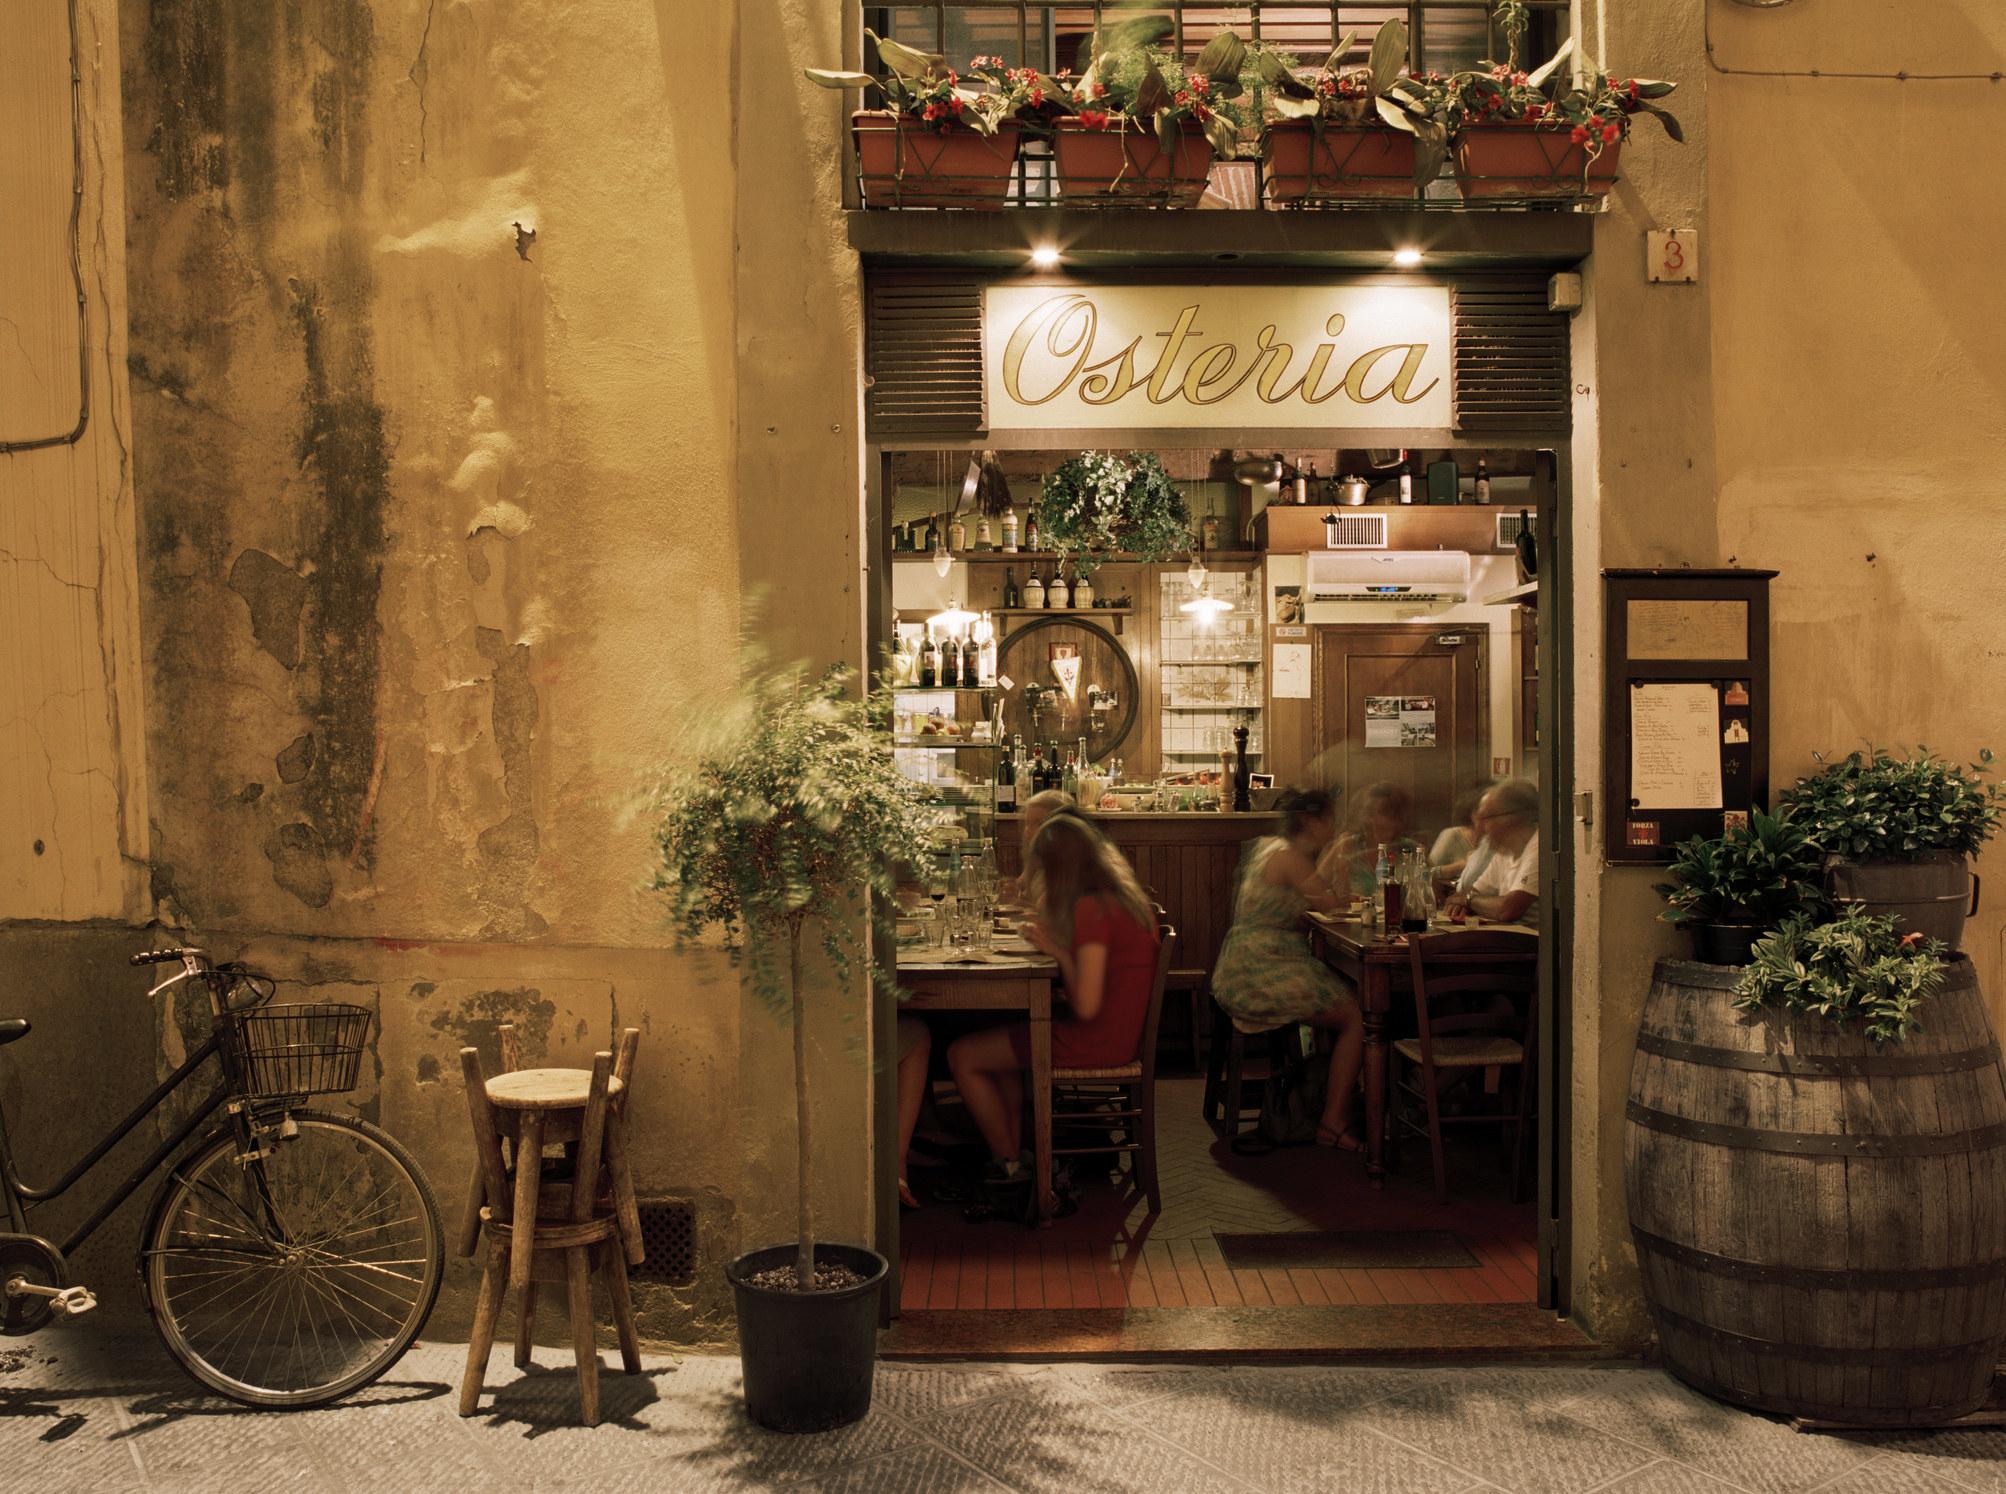 A cute Italian Osteria.